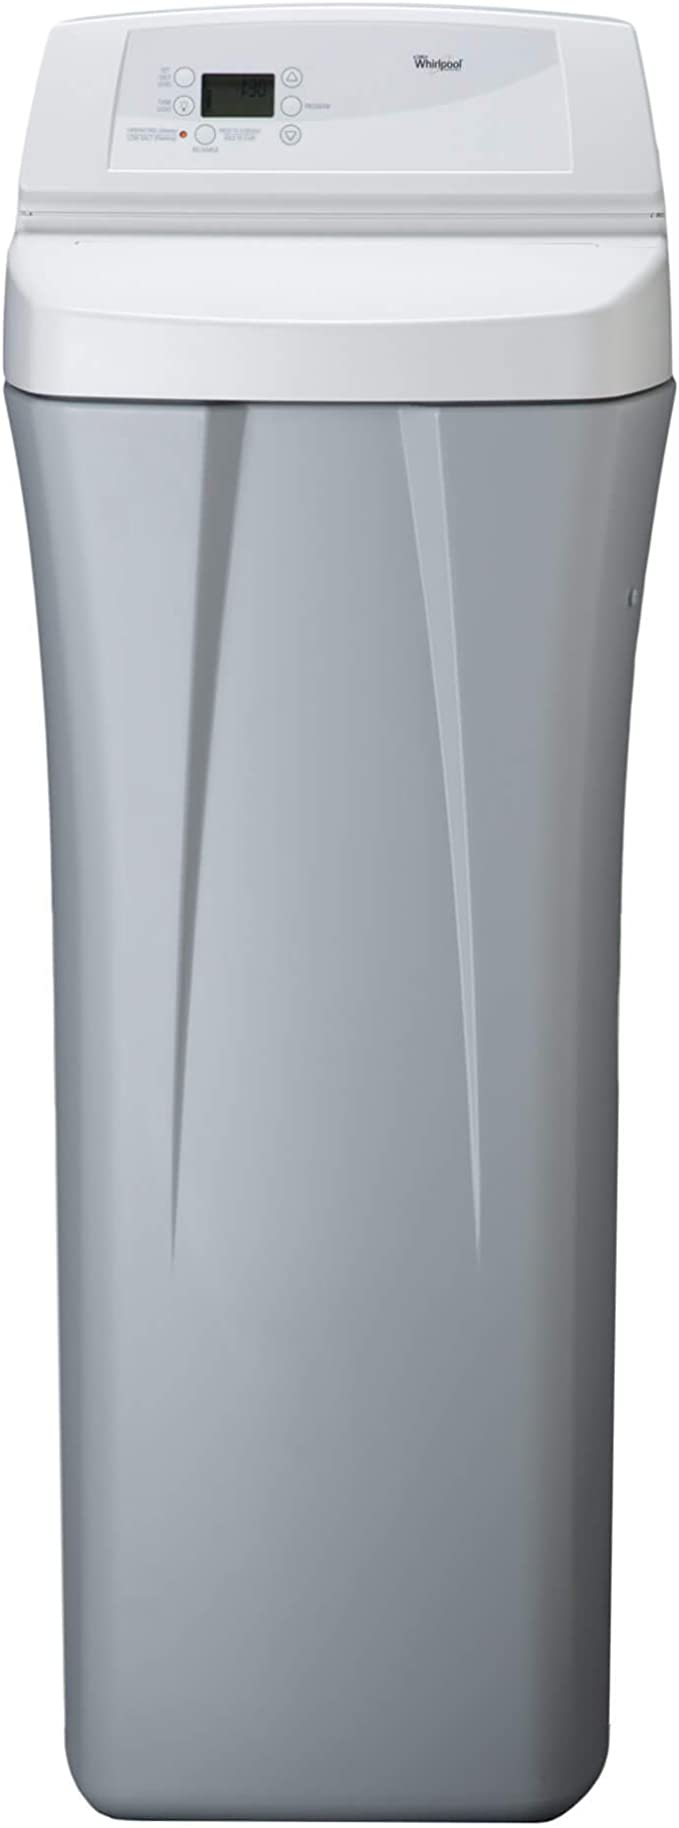 Best Water Softeners: Whirlpool WHES40E 40,000 Grain Water Softener